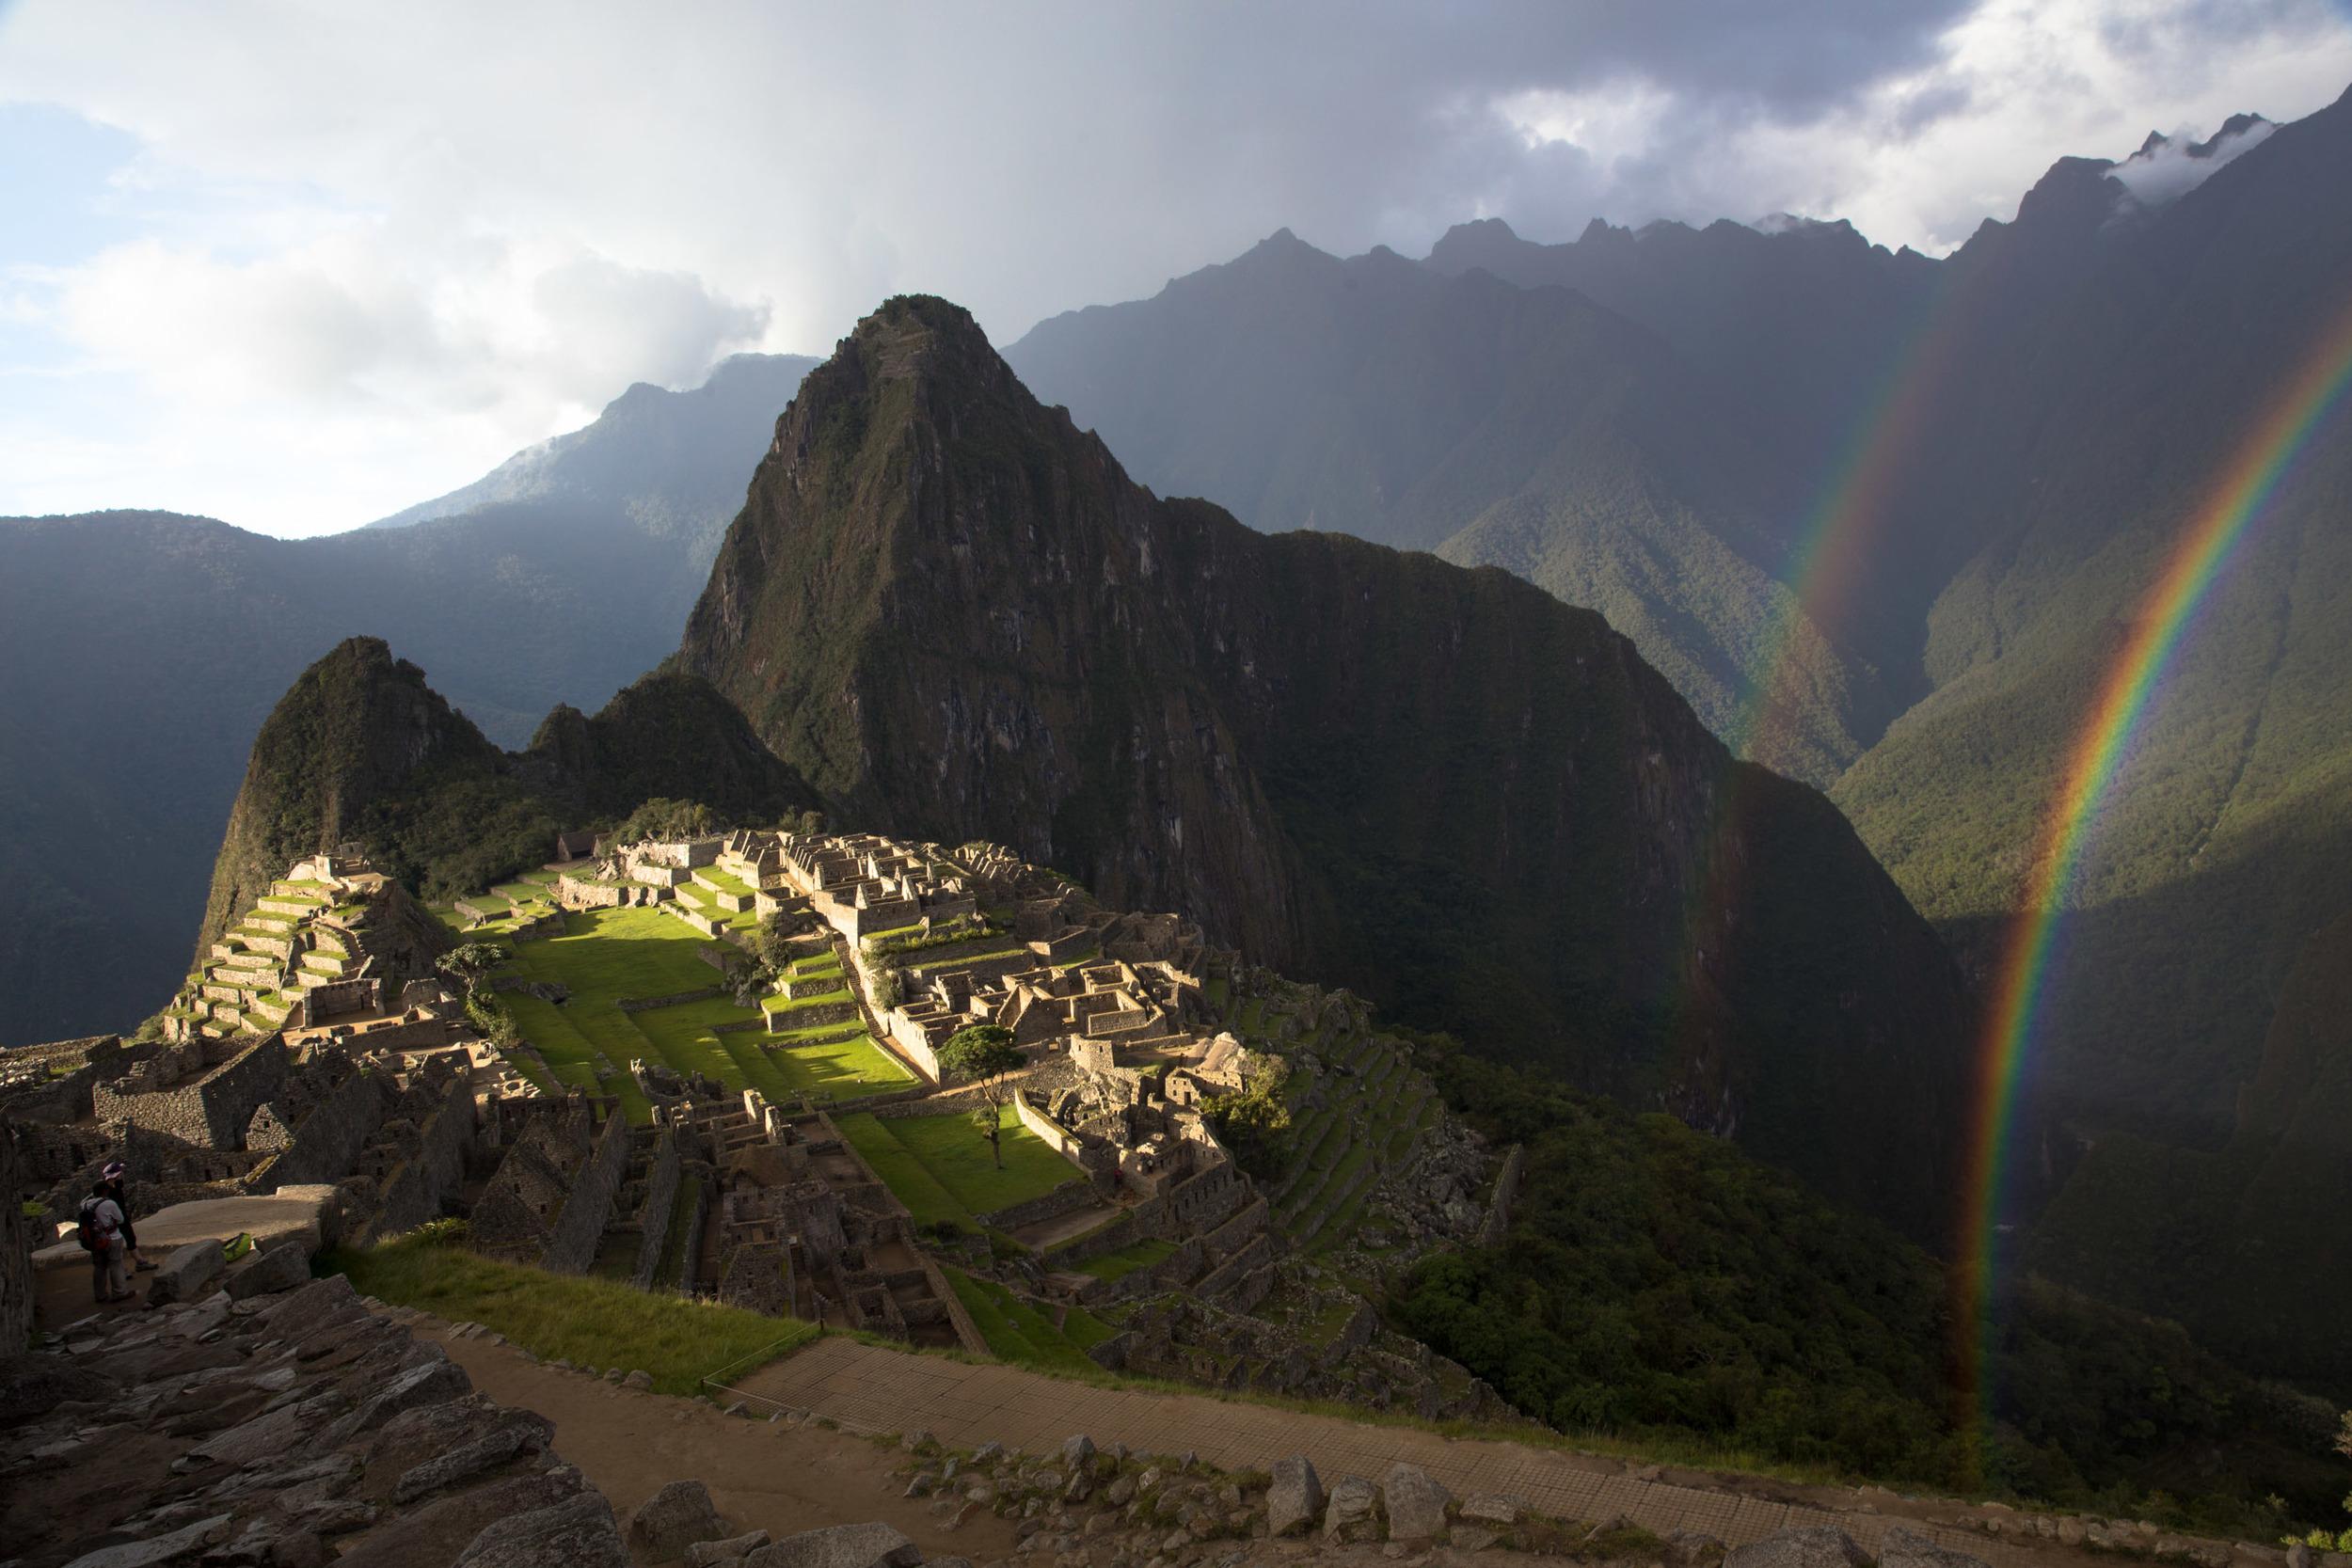 Machu Picchu and a rainbow